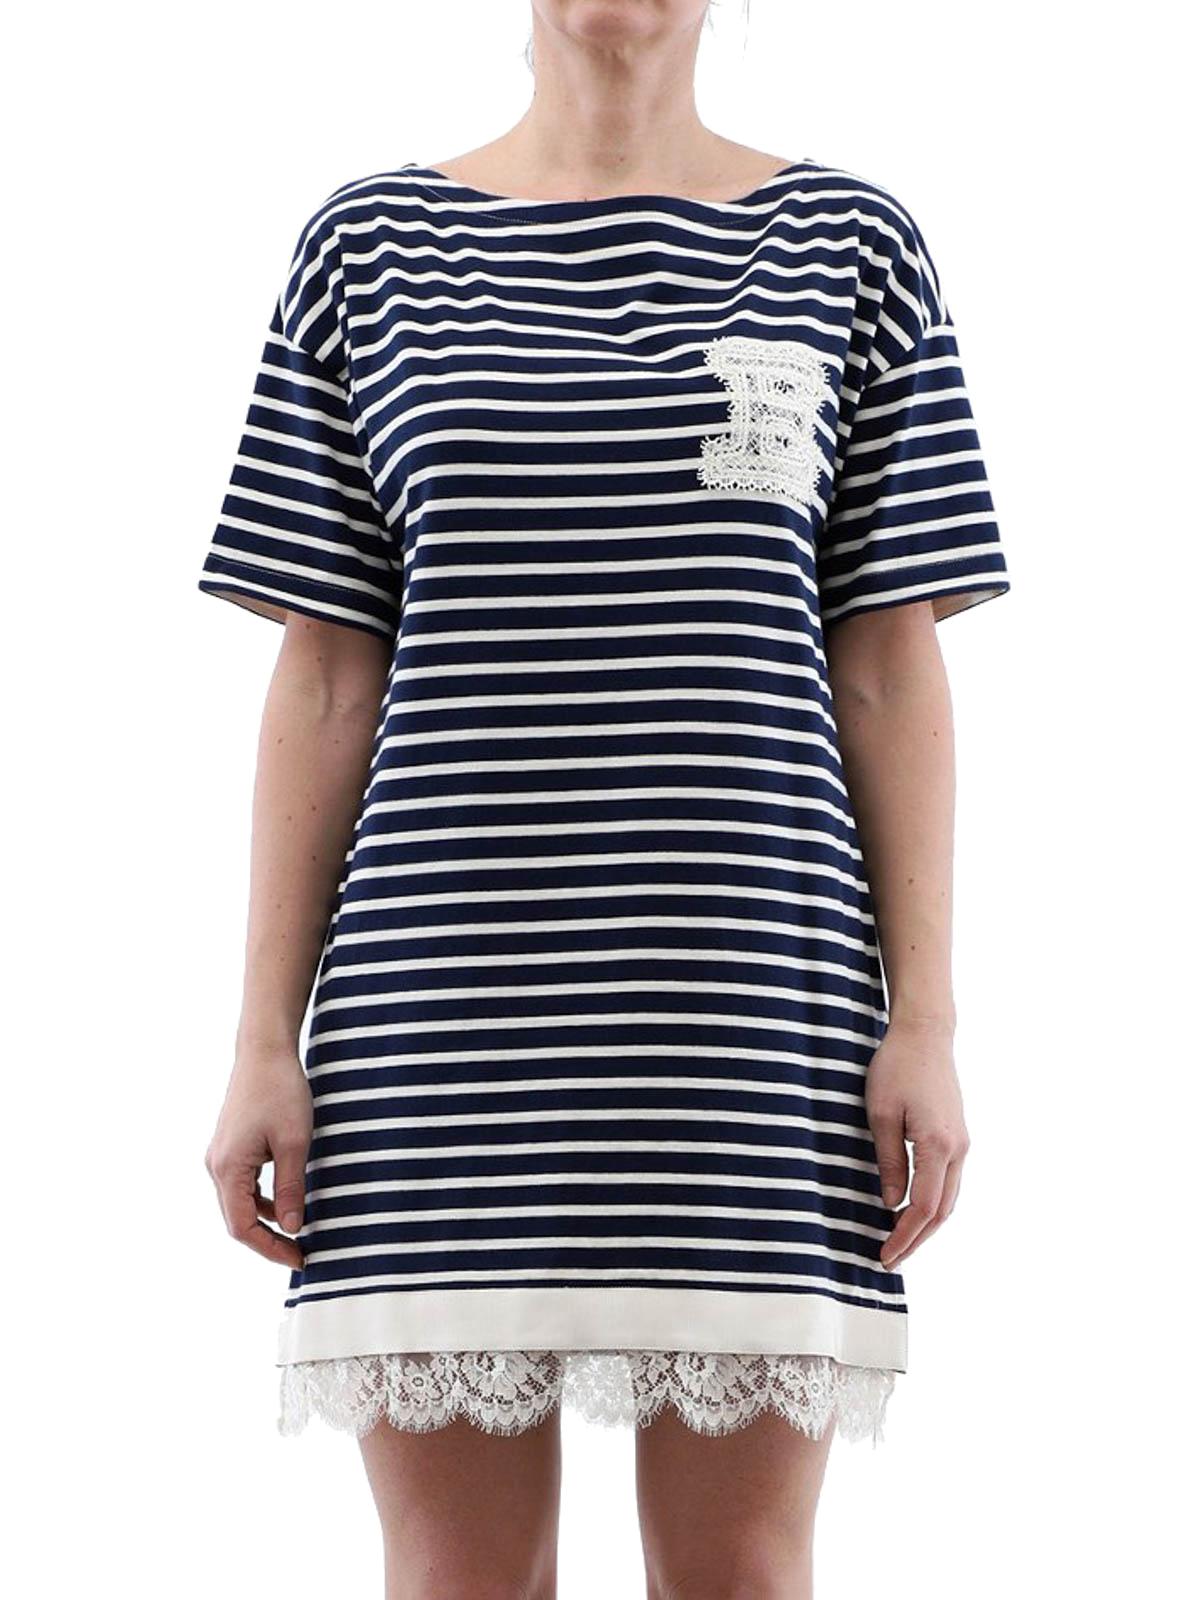 26d9e8ee5251 iKRIX ERMANNO SCERVINO  short dresses - Lace trimmed striped cotton dress